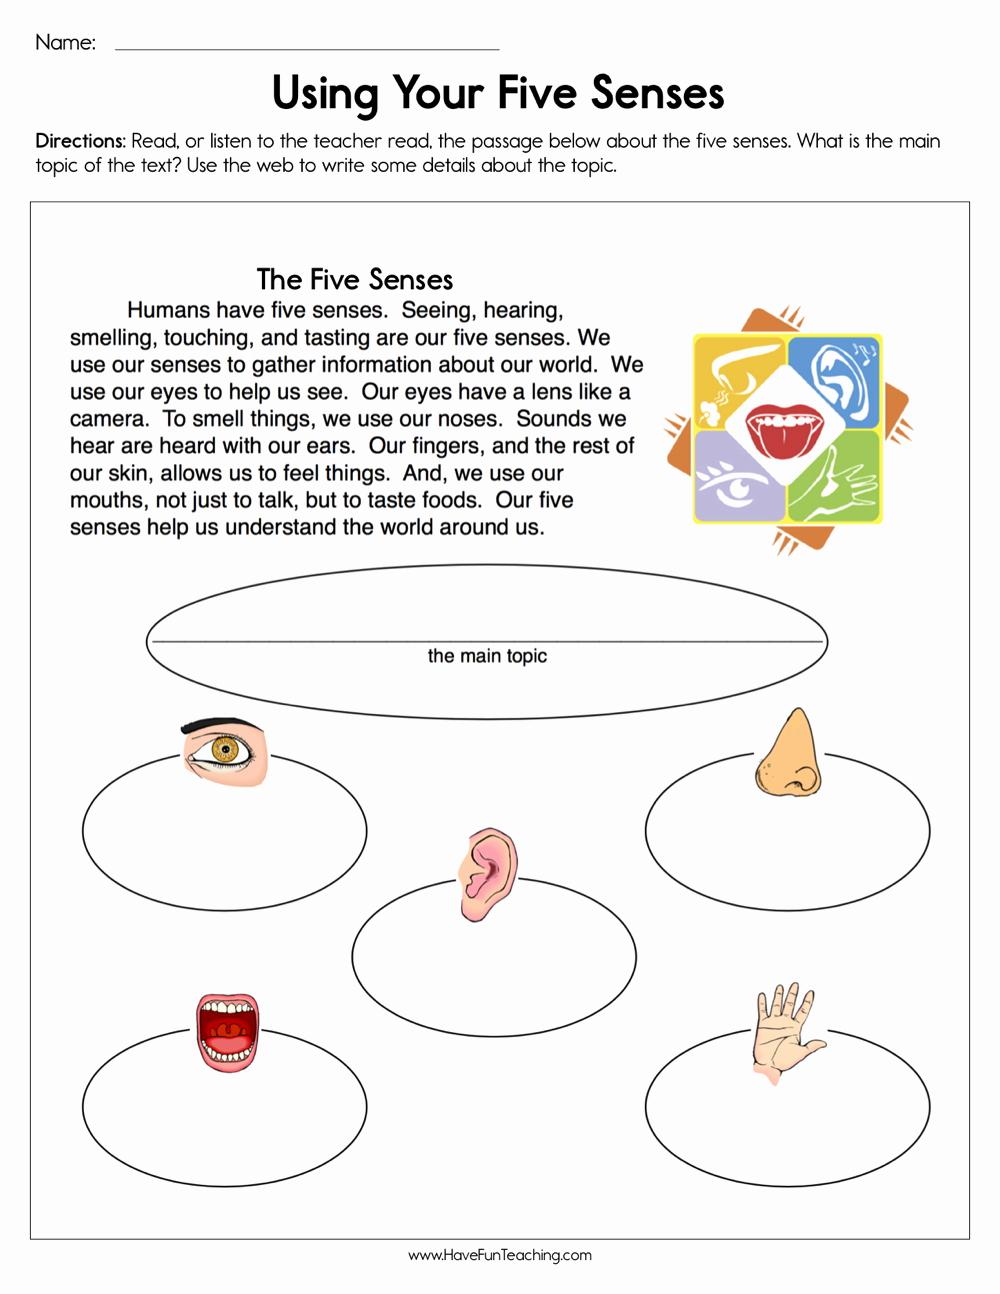 Sensory Detail Worksheet Elegant Using Your Five Senses Worksheet